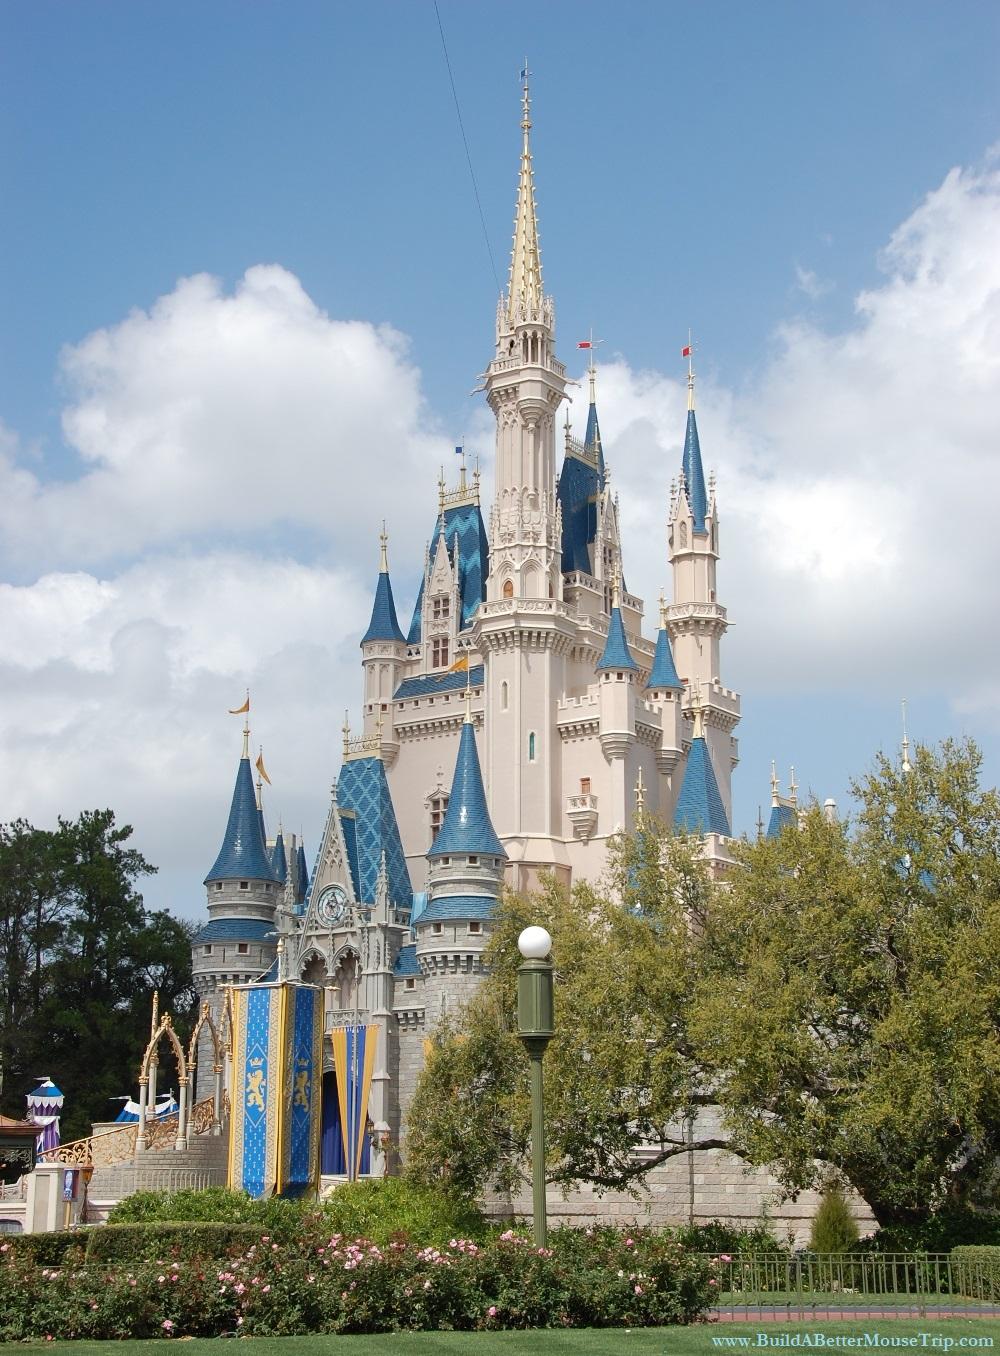 Cinderella's Castle in the Magic Kingdom at Disney World.